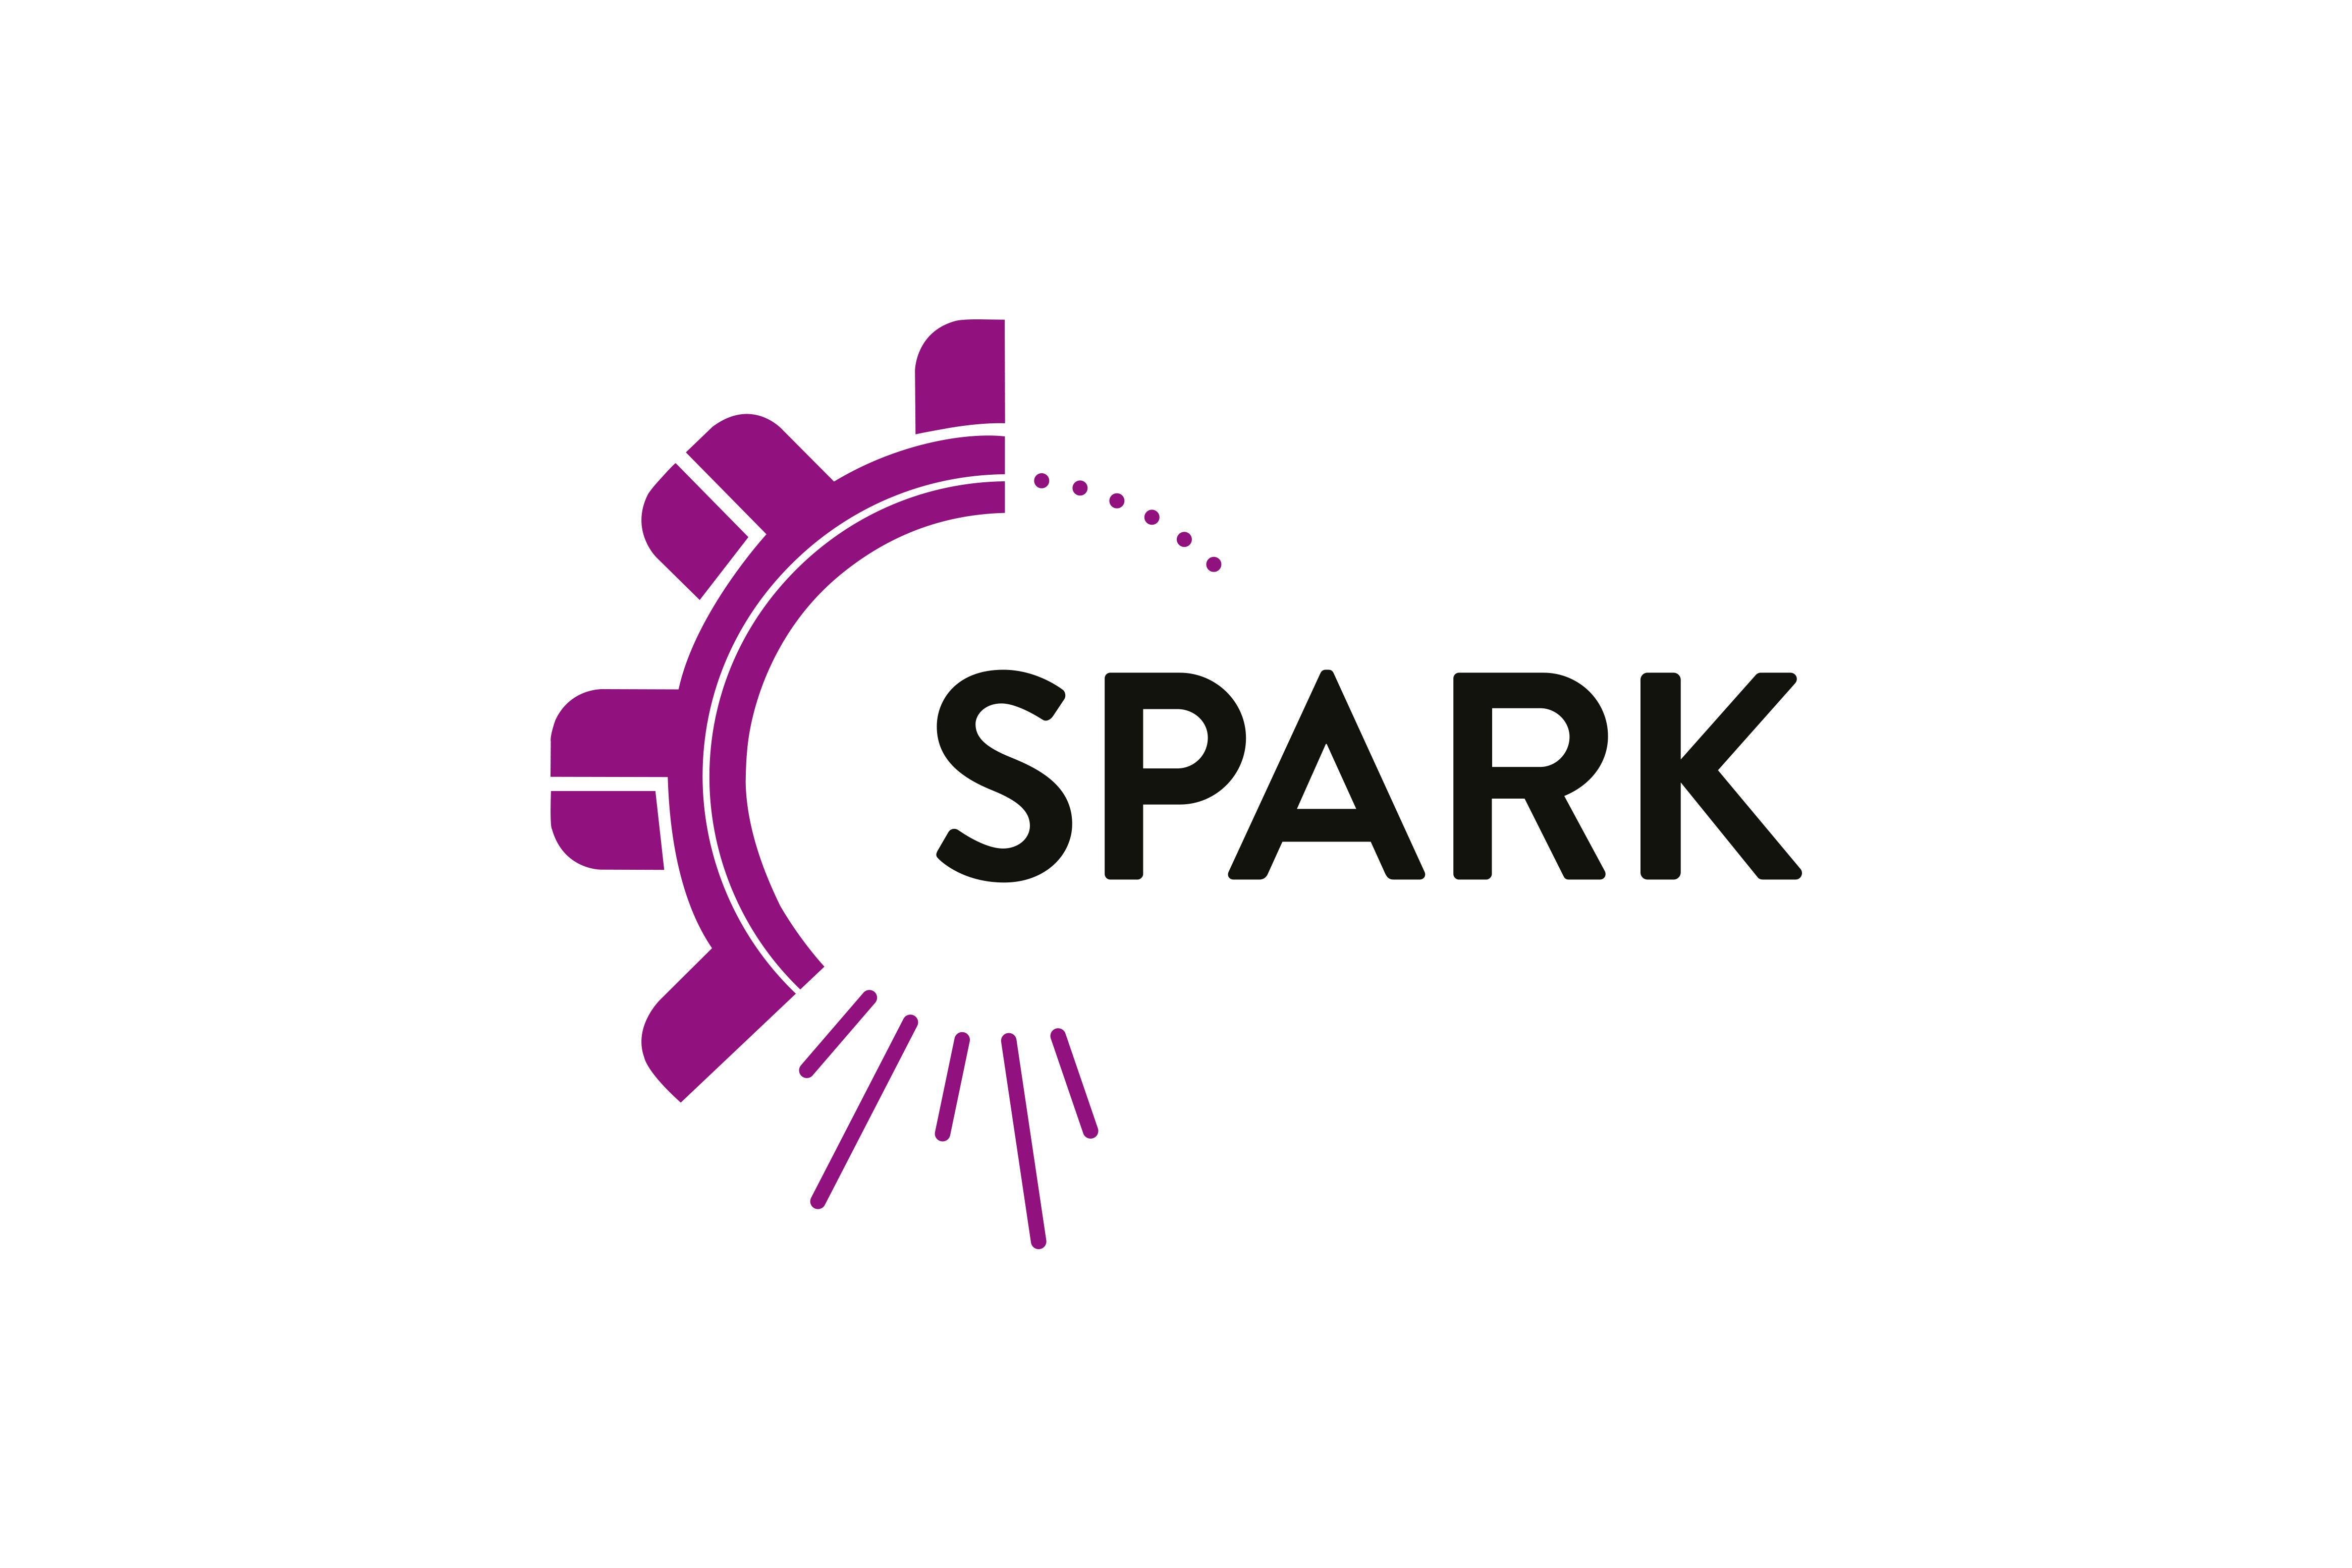 JU_Spark1